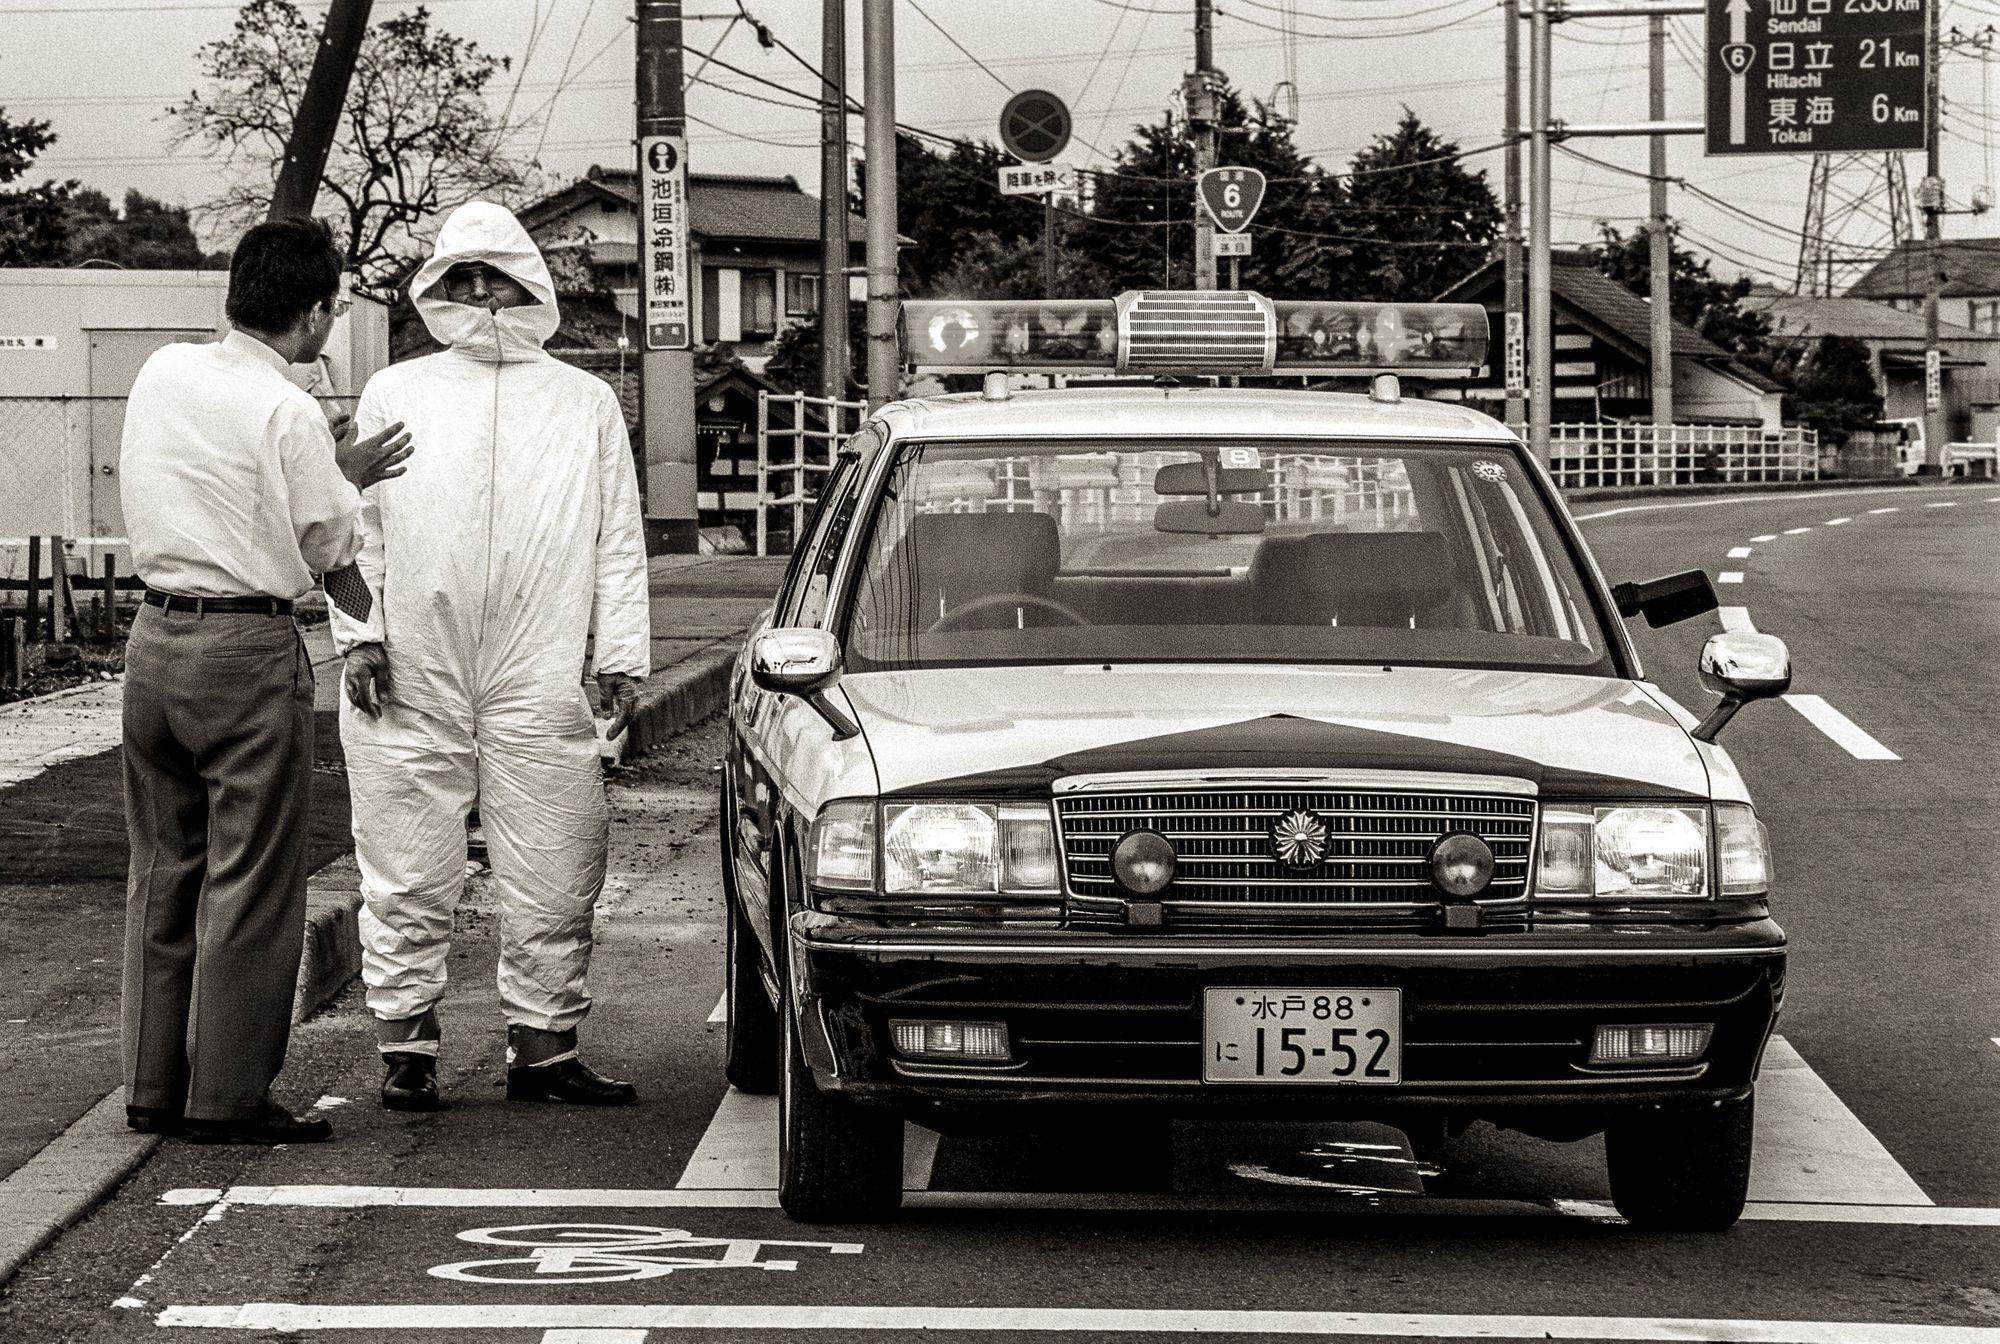 tokaimura_010 copy.jpg